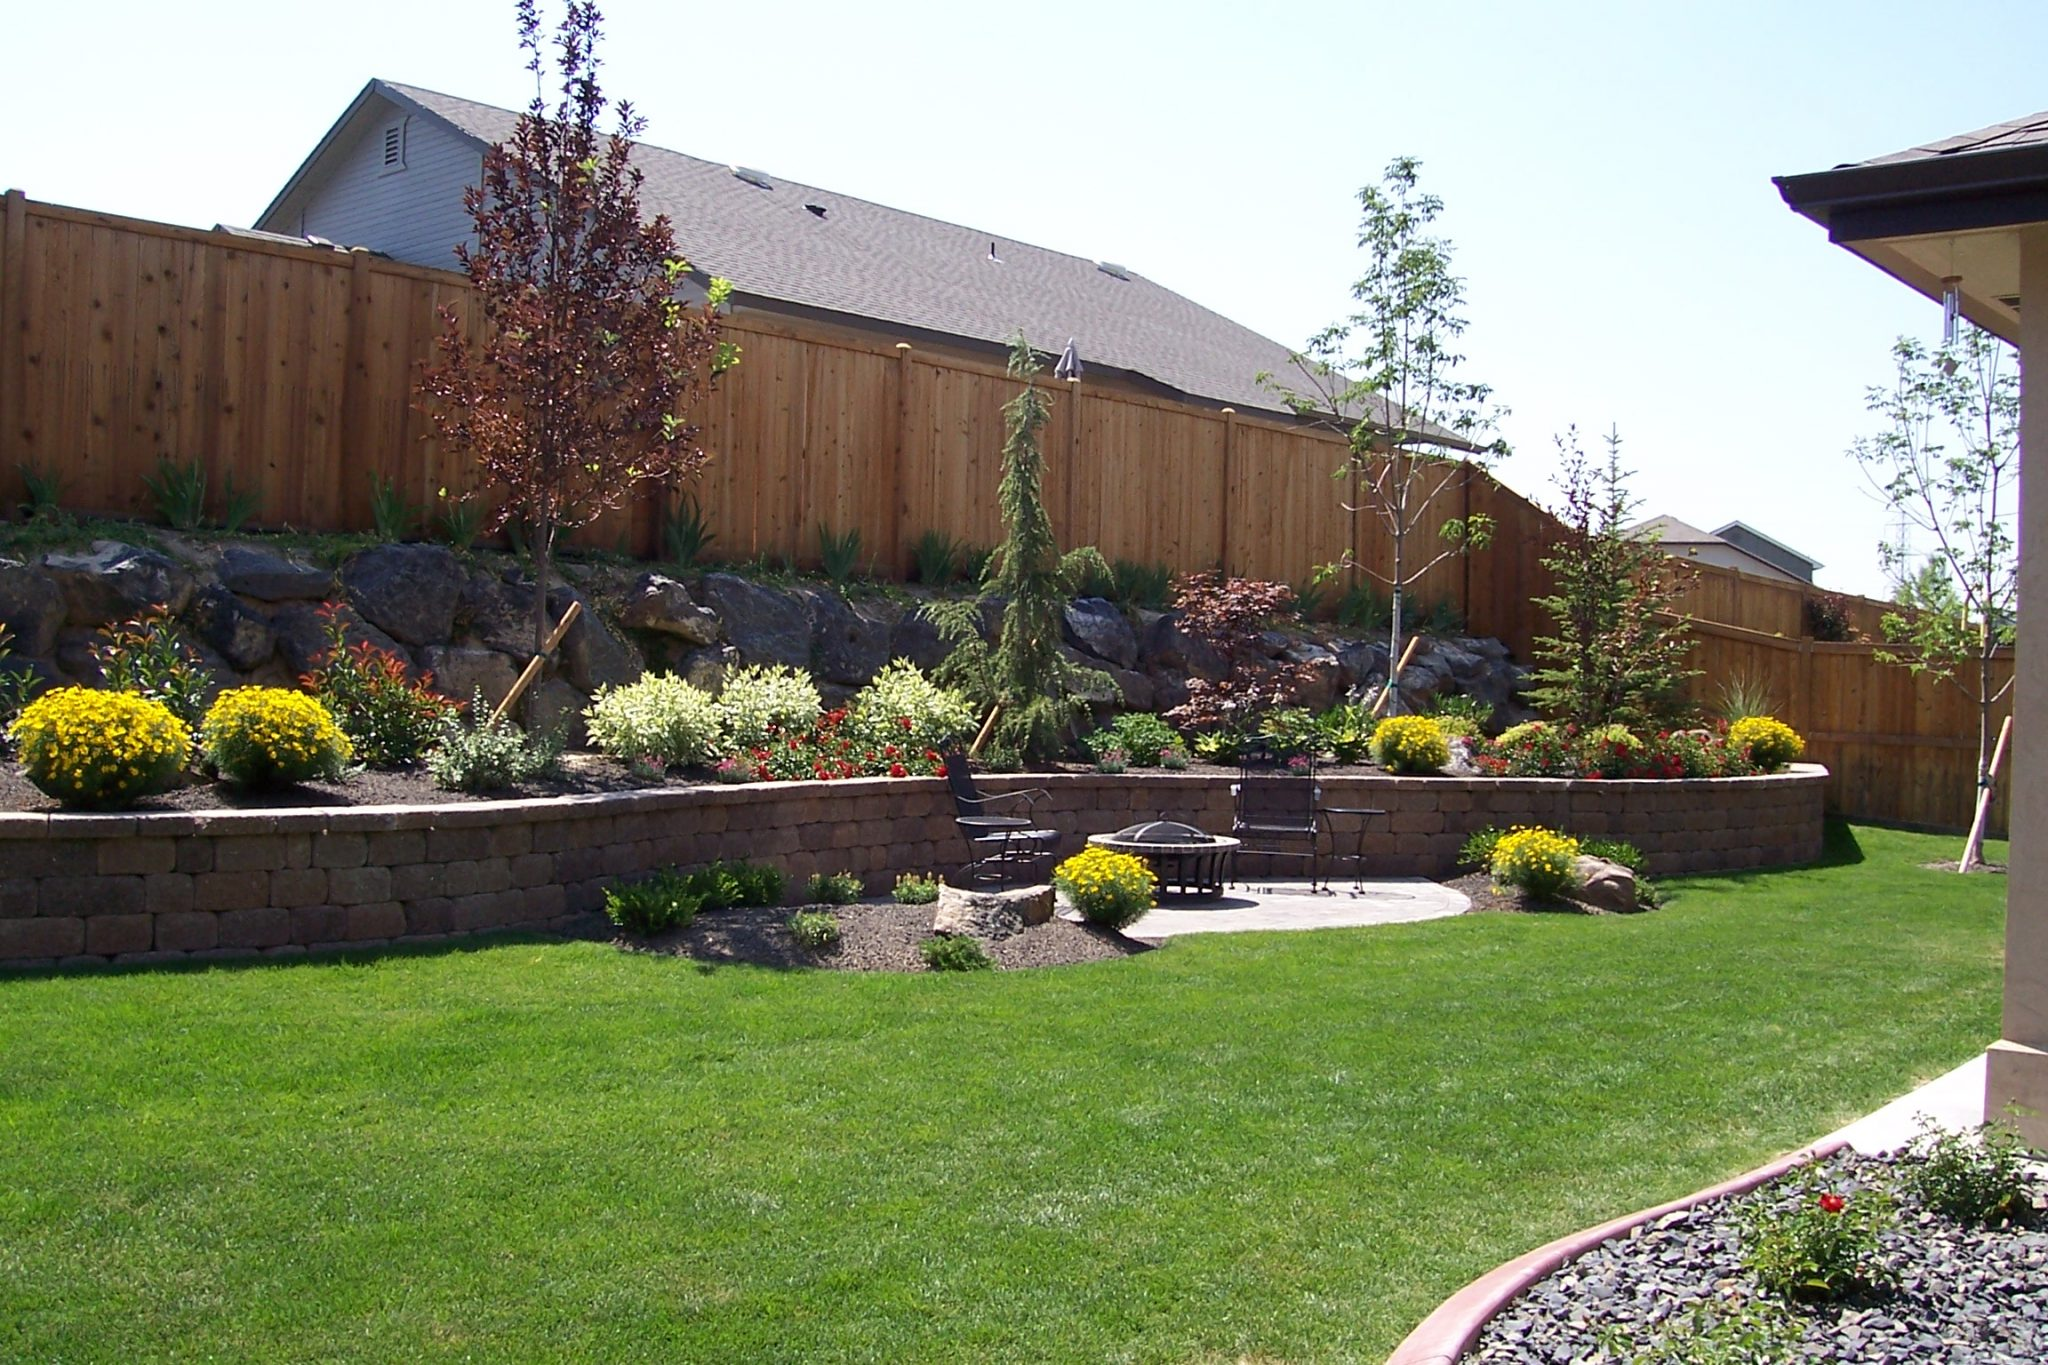 meridian backyard landscaping